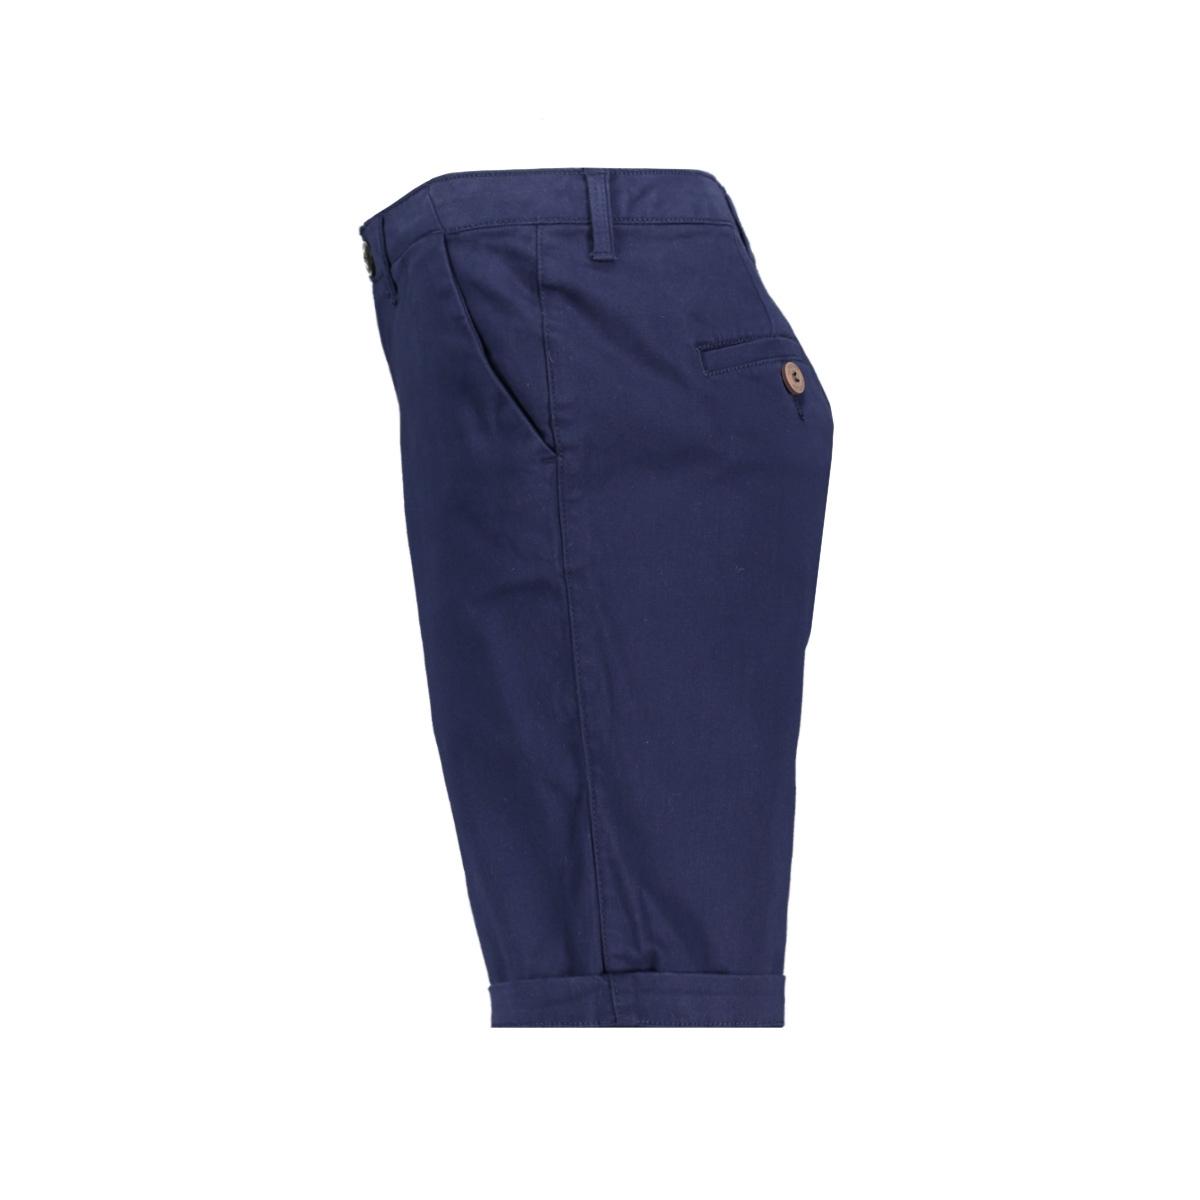 city chino short w7110007a superdry korte broek atlantic navy